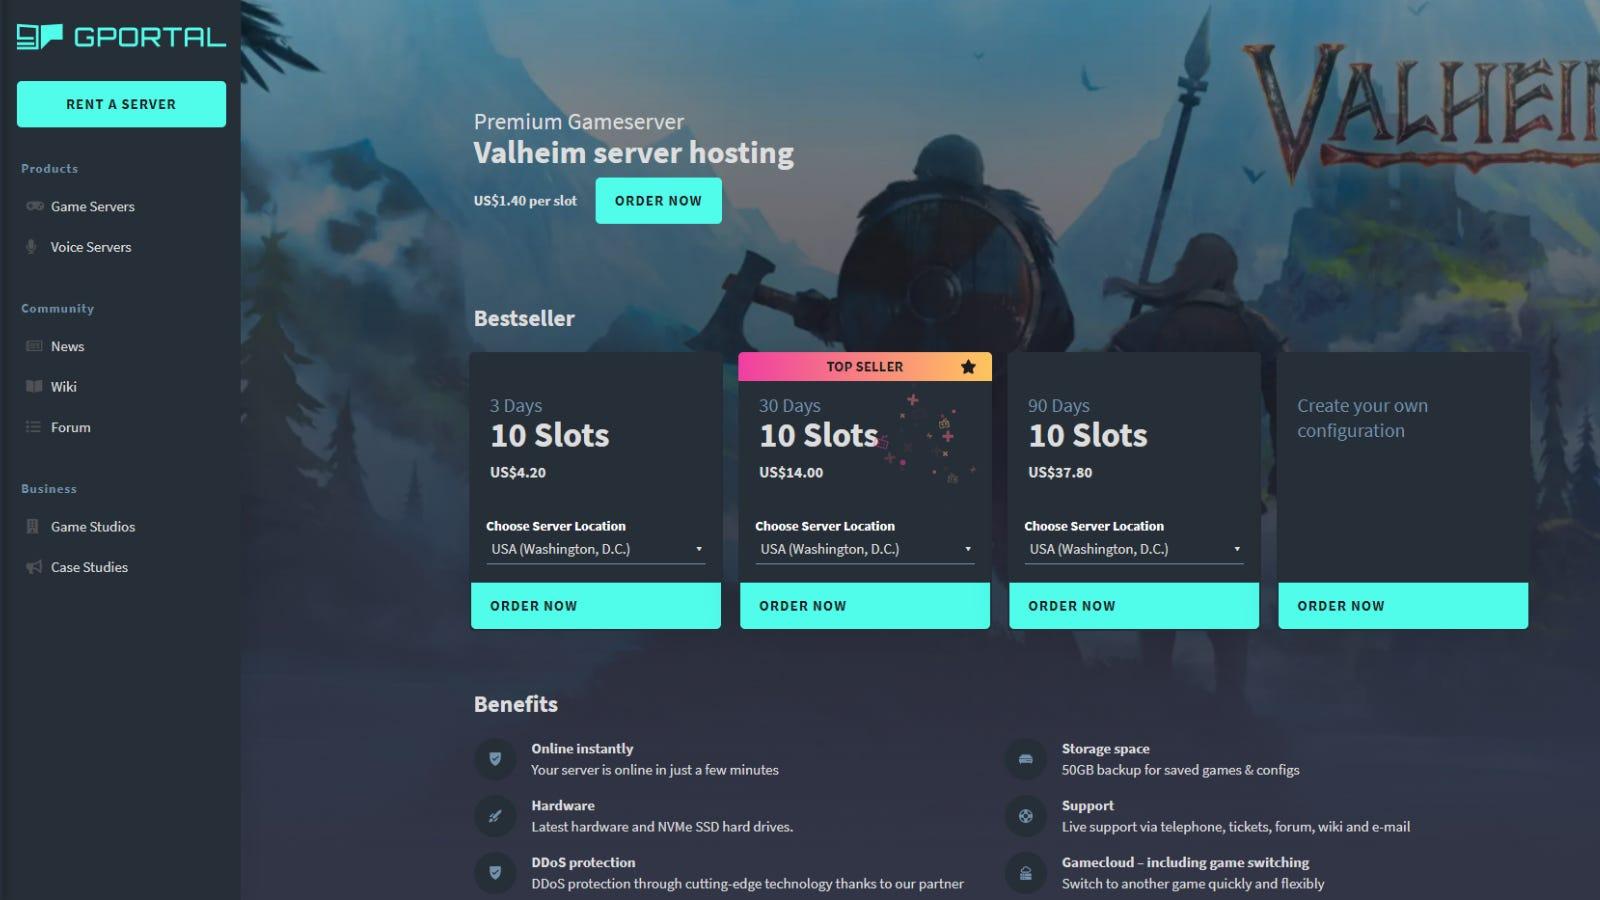 G-Portal's 'Valheim' server renting page